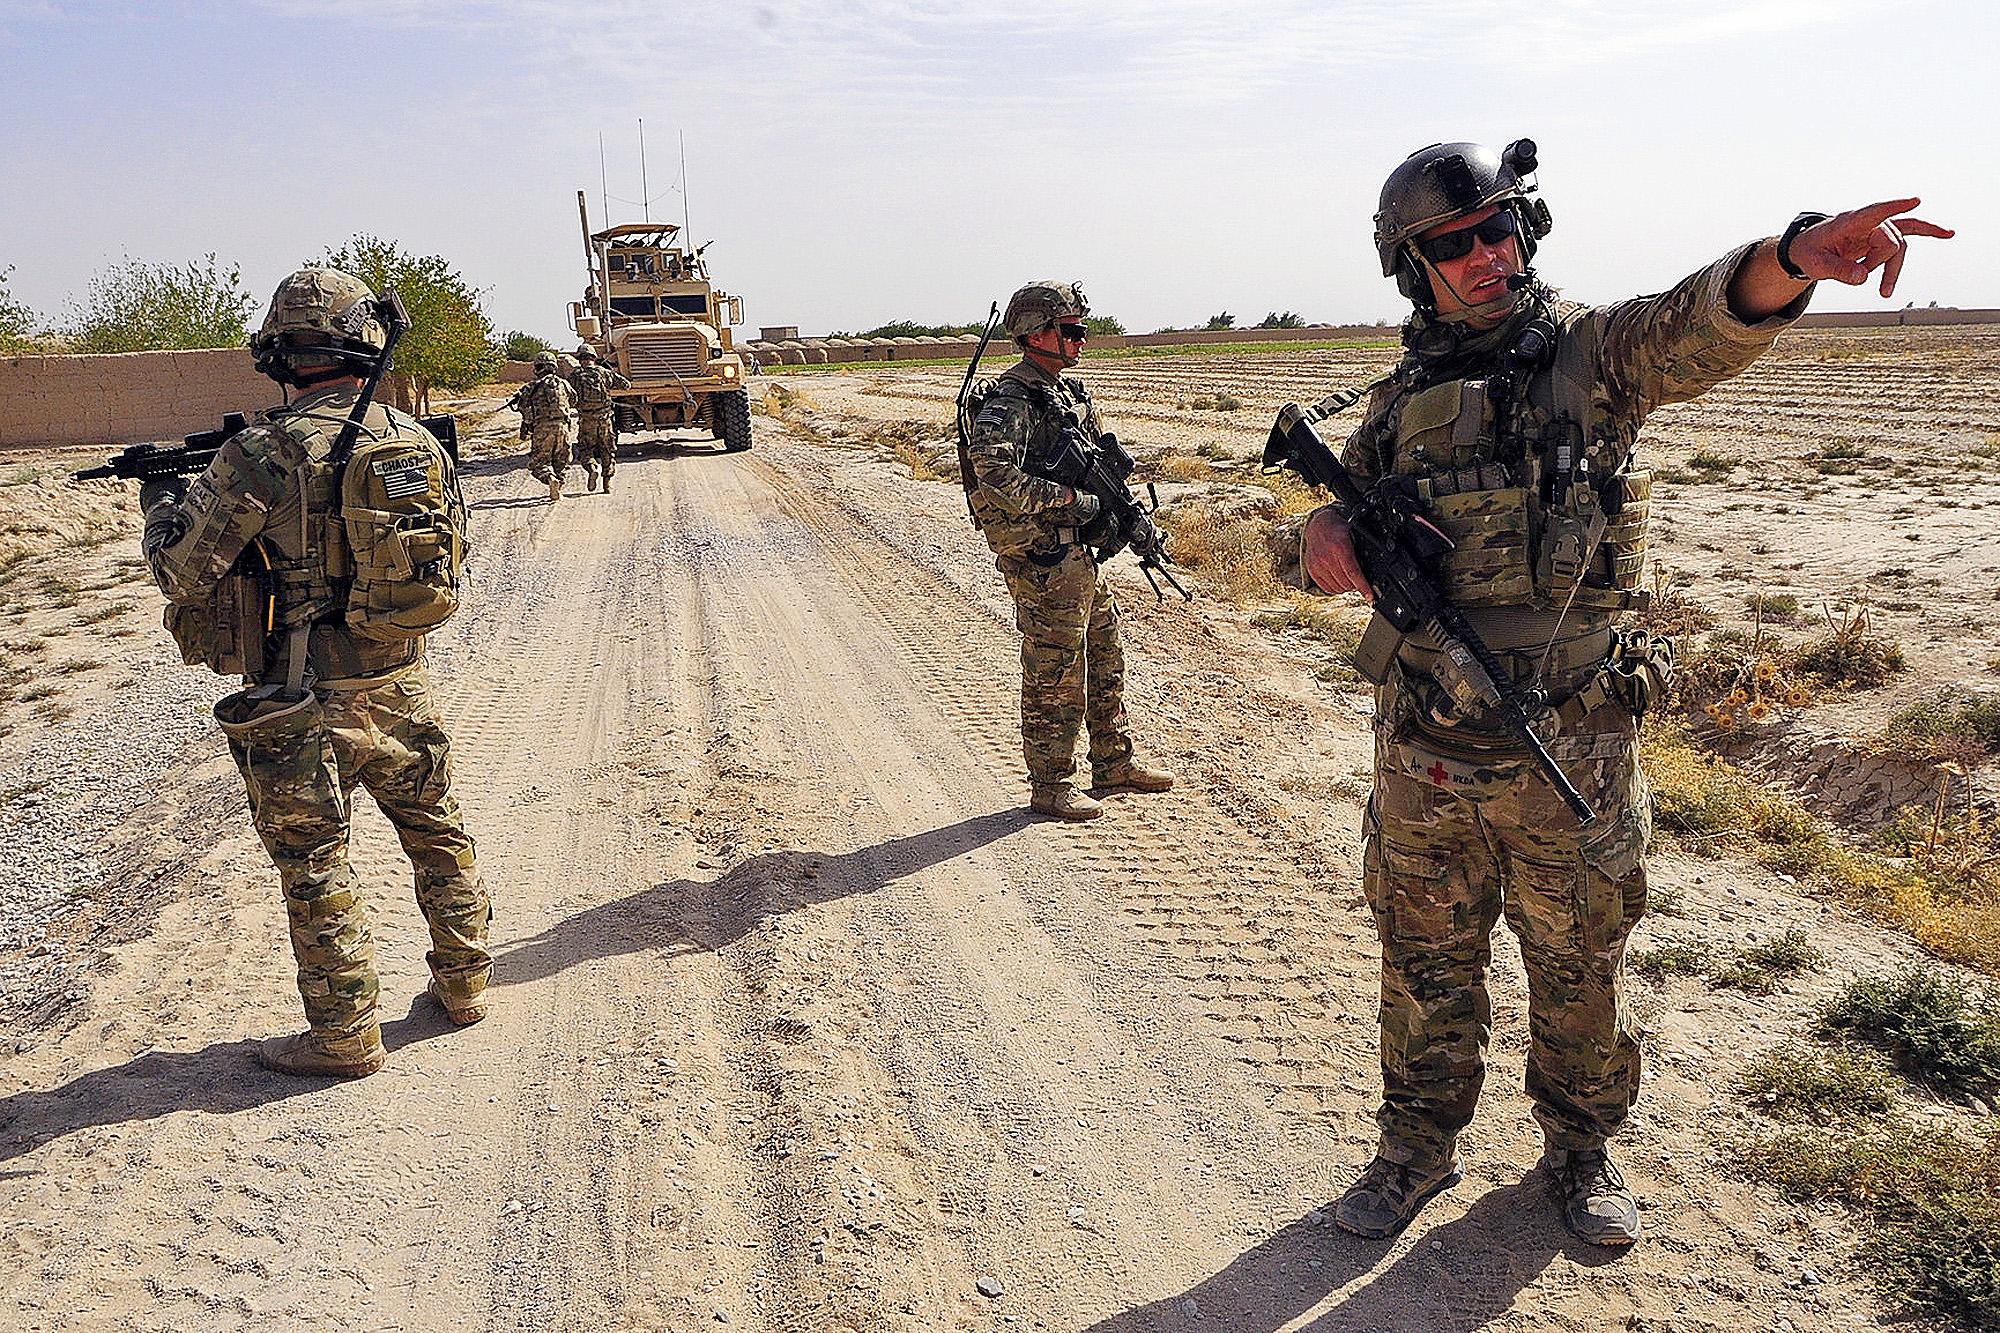 U.S. DEPARTMENT OF DEFENSE > Photos > Photo Essays > Essay View